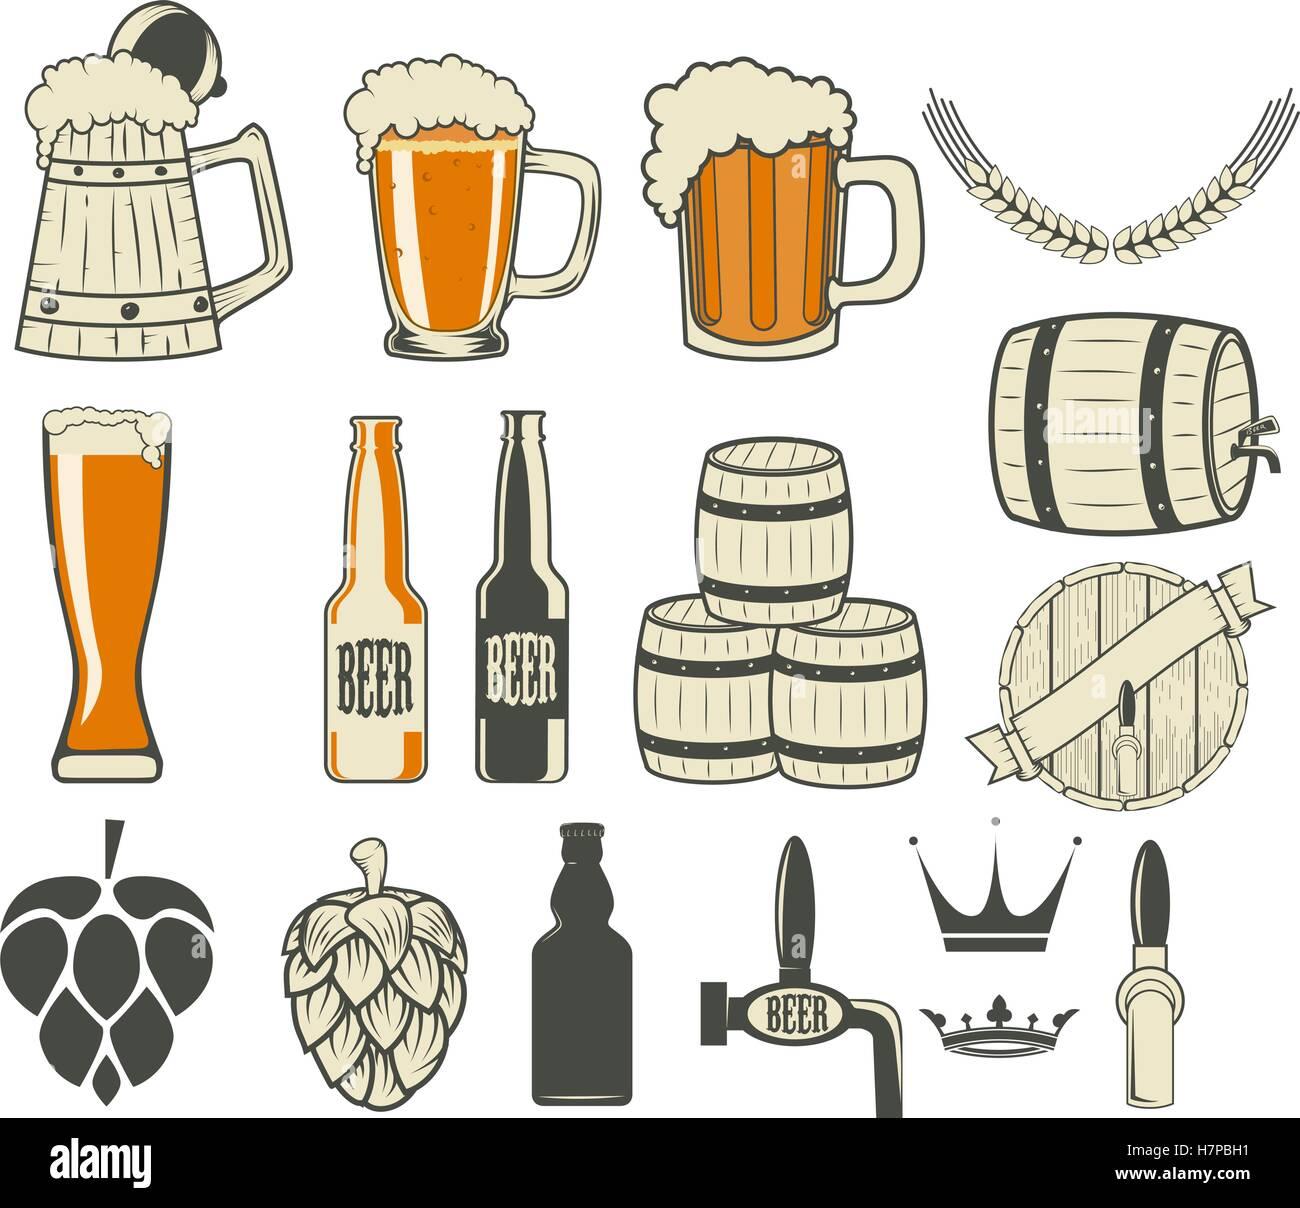 Beer Label Generator Stock Vector Art Illustration Image